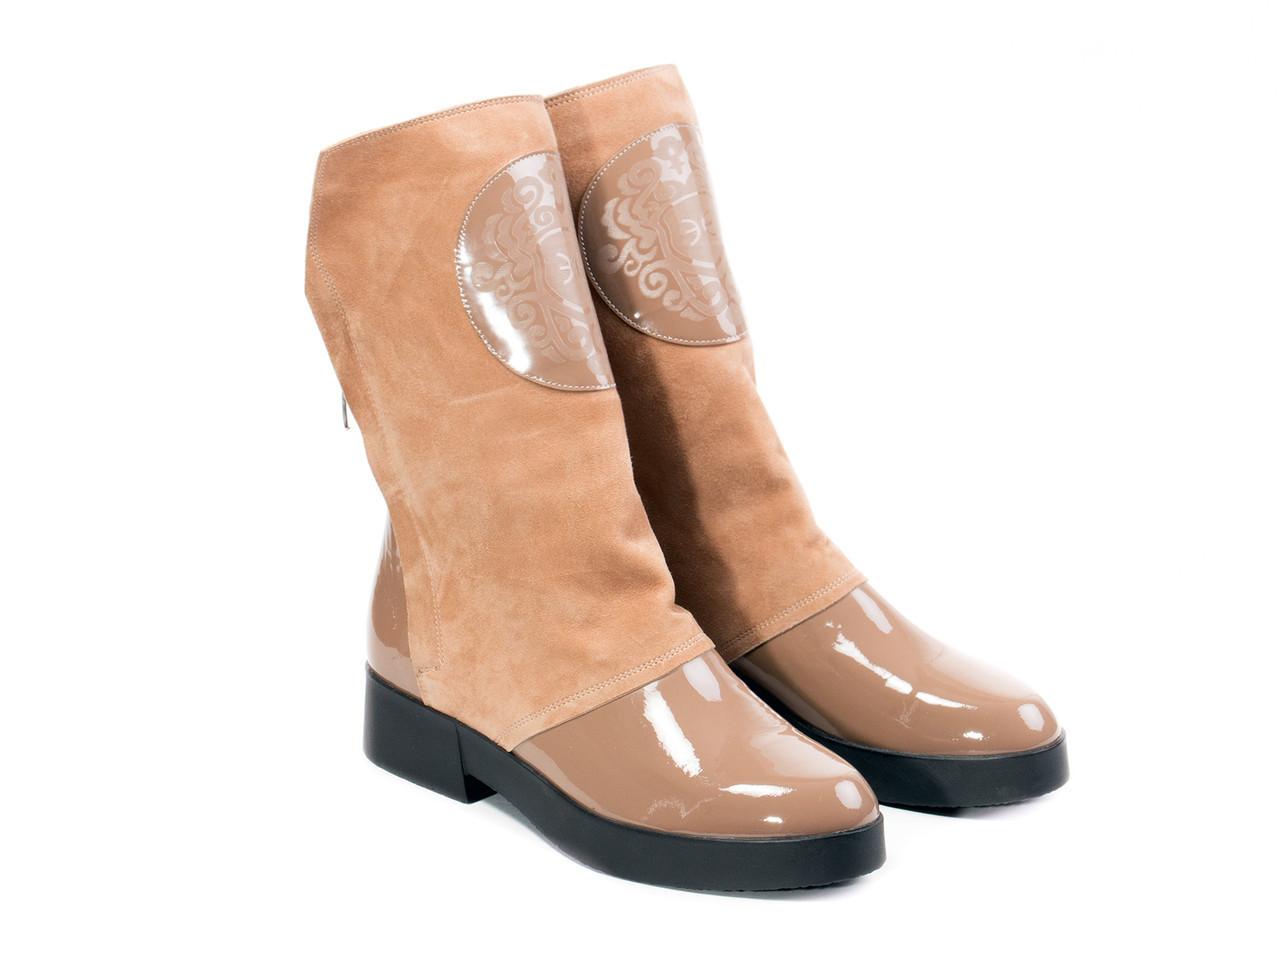 Ботинки Etor 4937-0-7235 39 бежевые